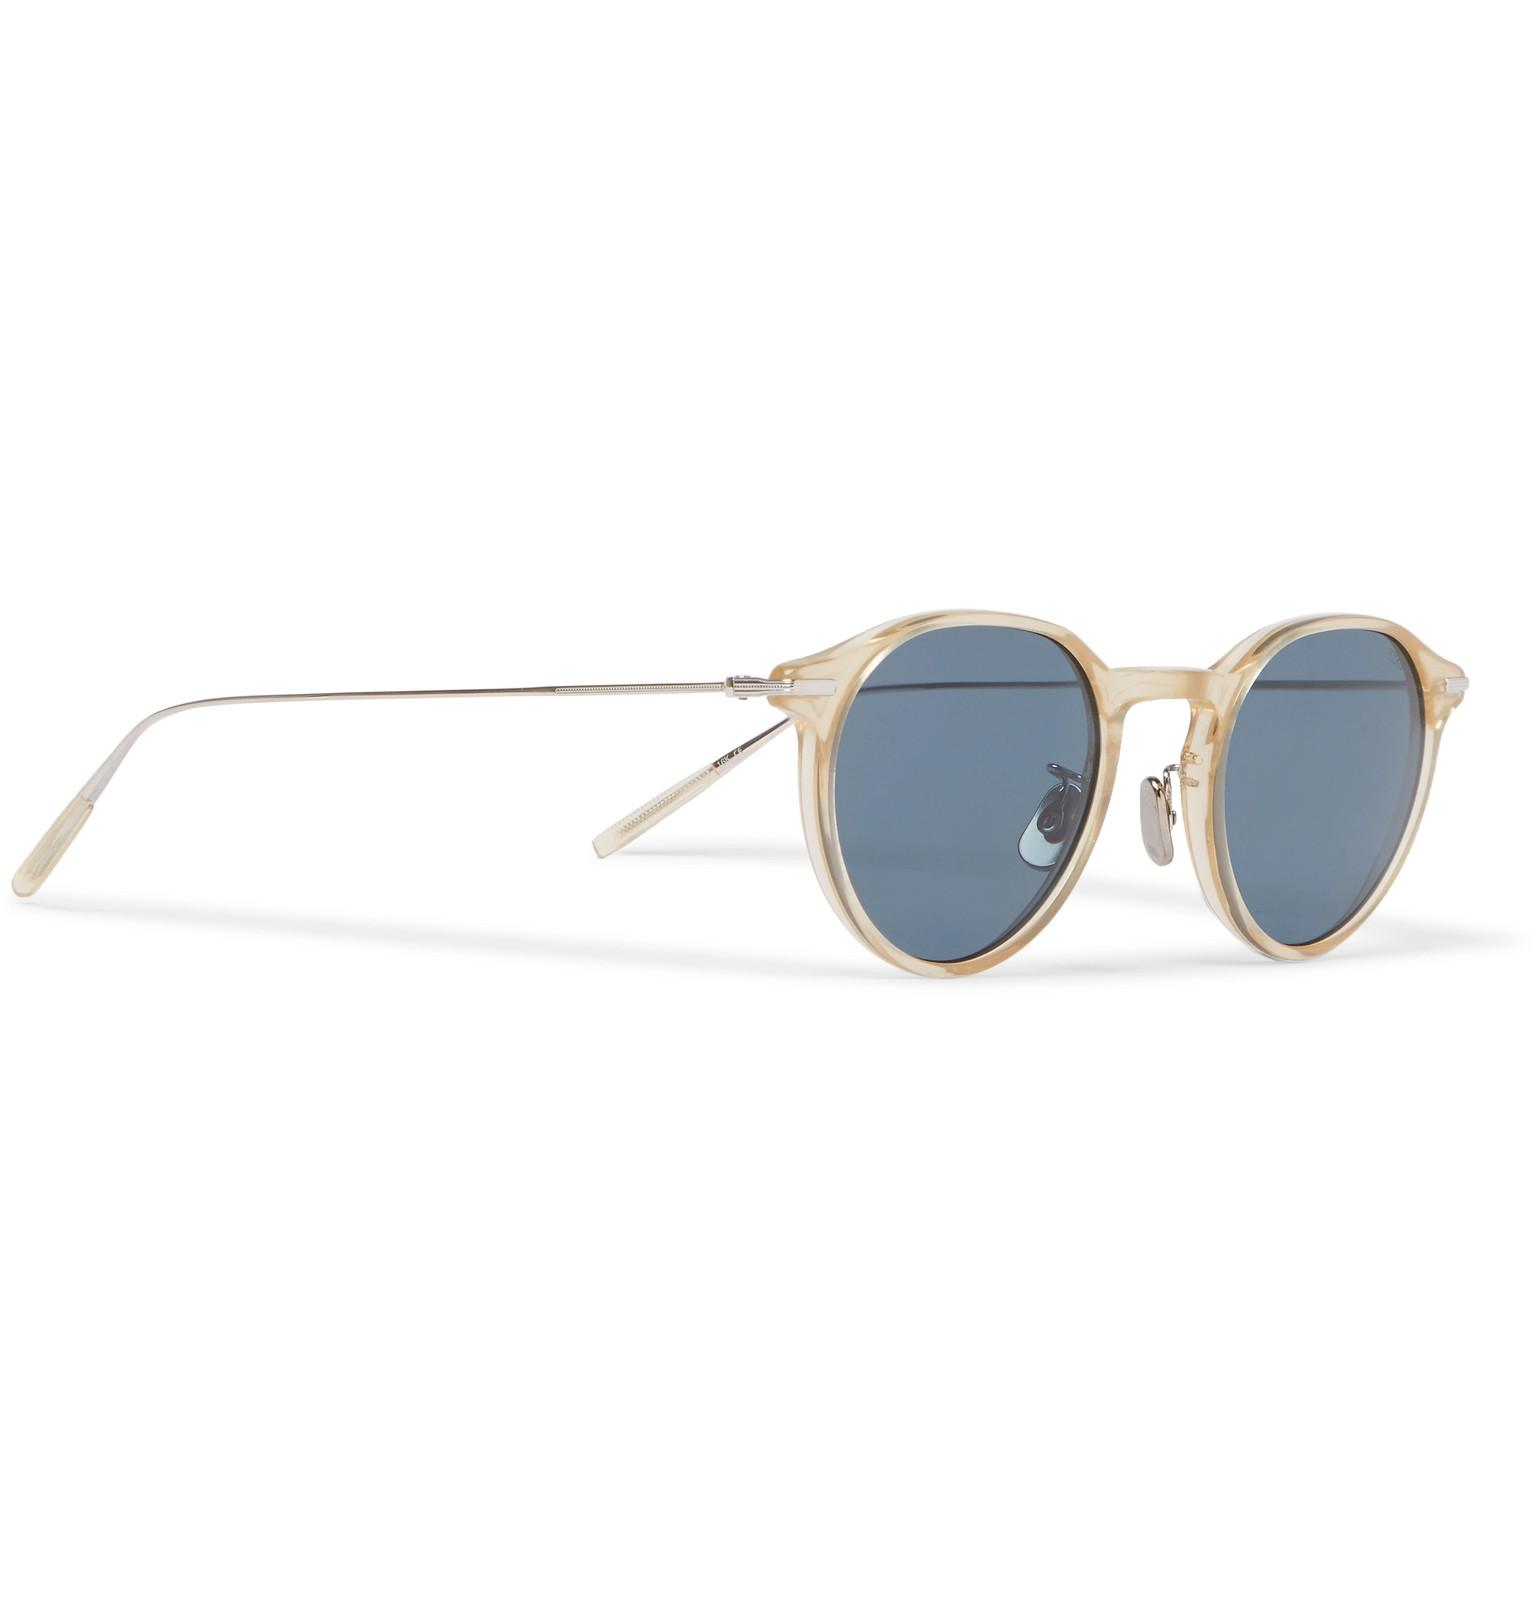 c99b861ddda Lyst - Eyevan 7285 749 Round-frame Acetate And Titanium Sunglasses ...